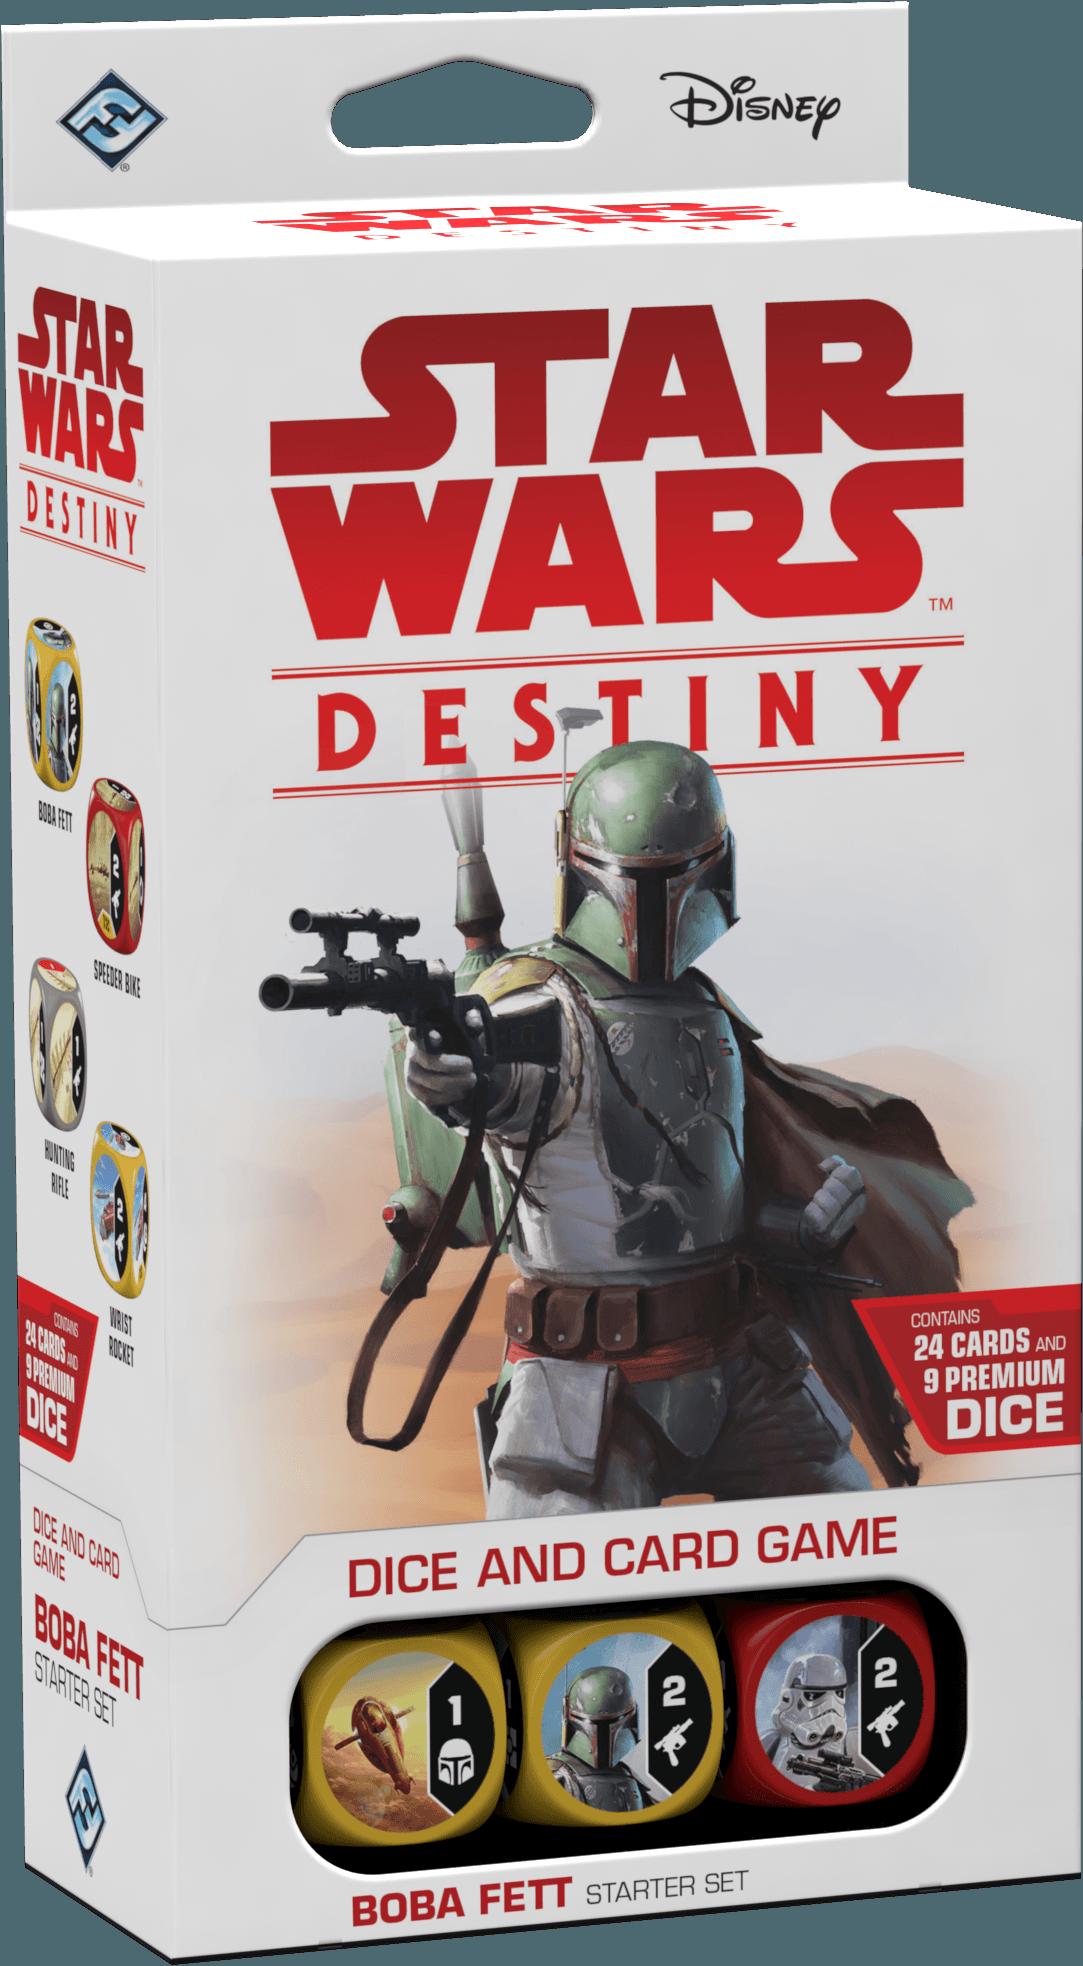 Star Wars: Destiny – Boba Fett Starter Set